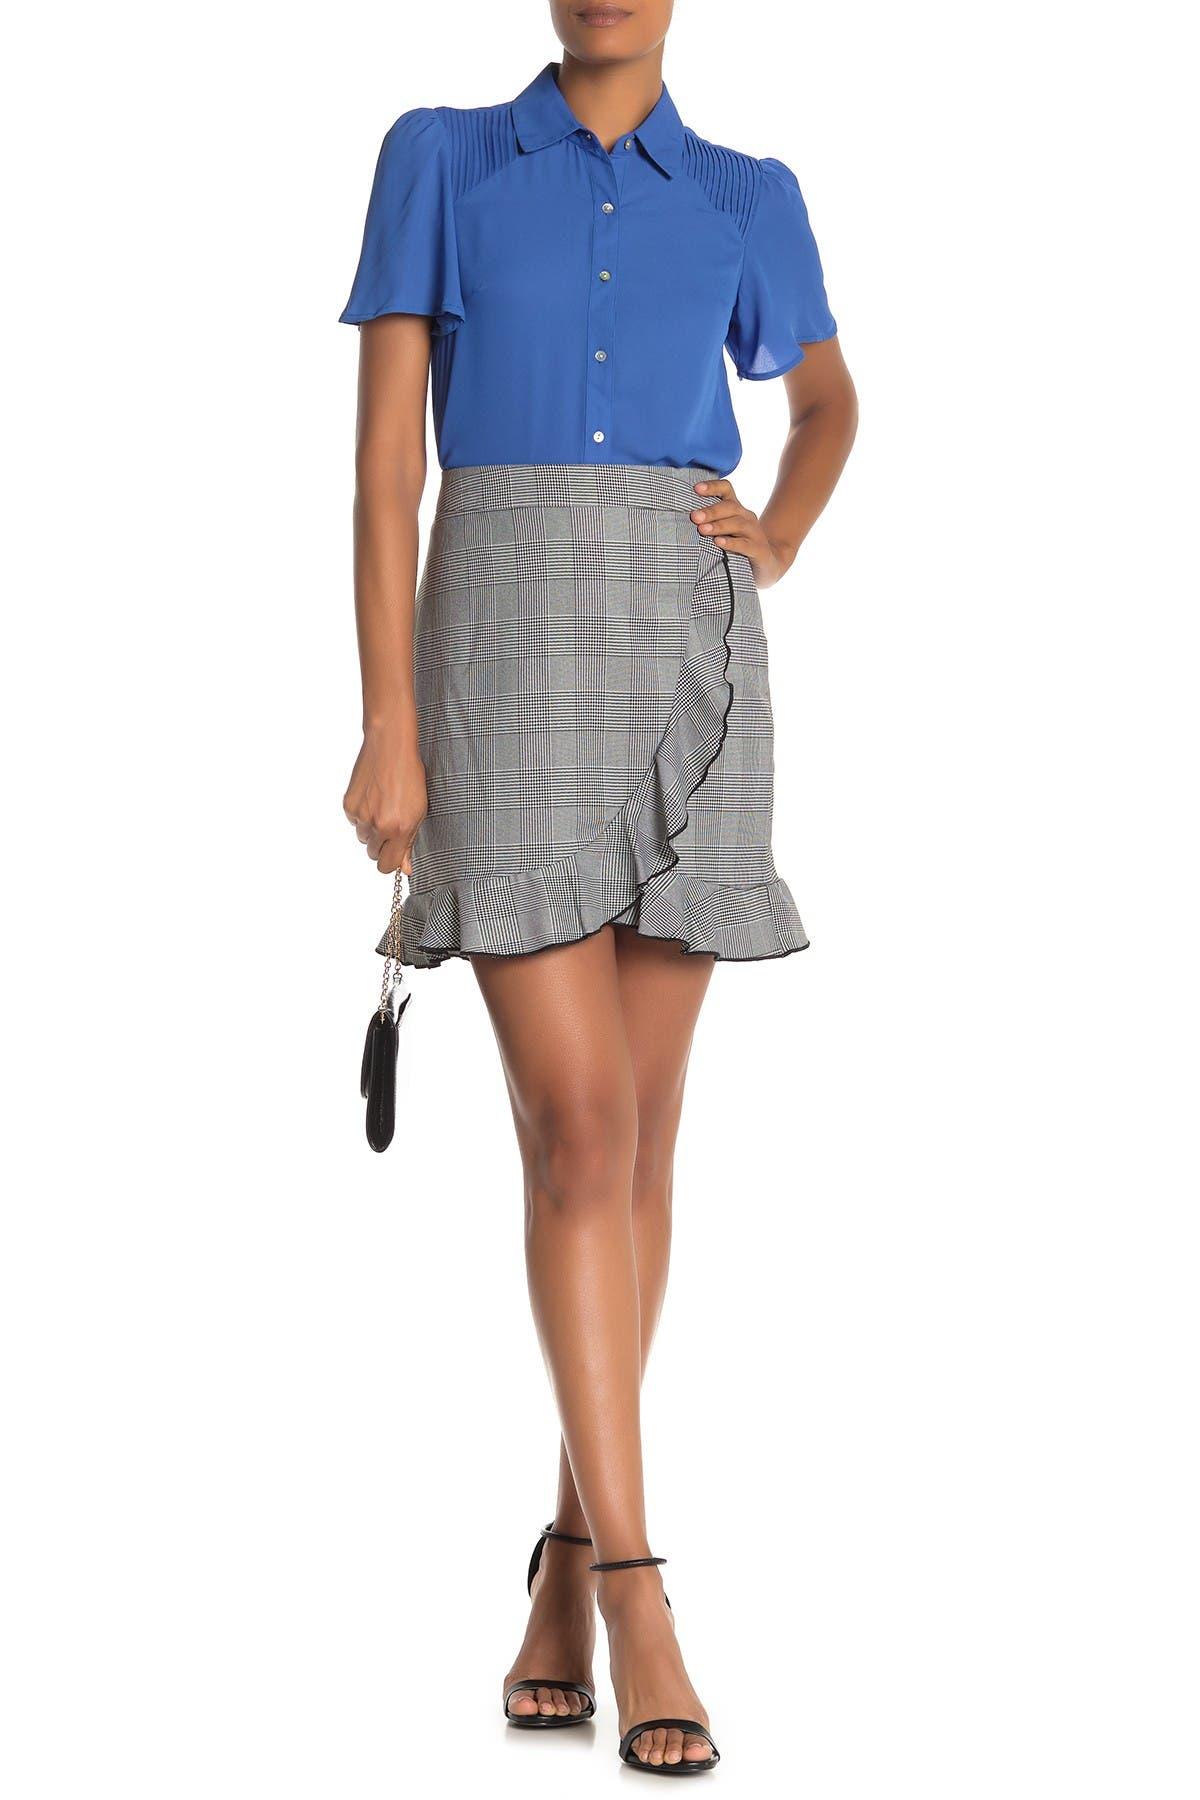 Image of NANETTE nanette lepore Ruffle Plaid Skirt